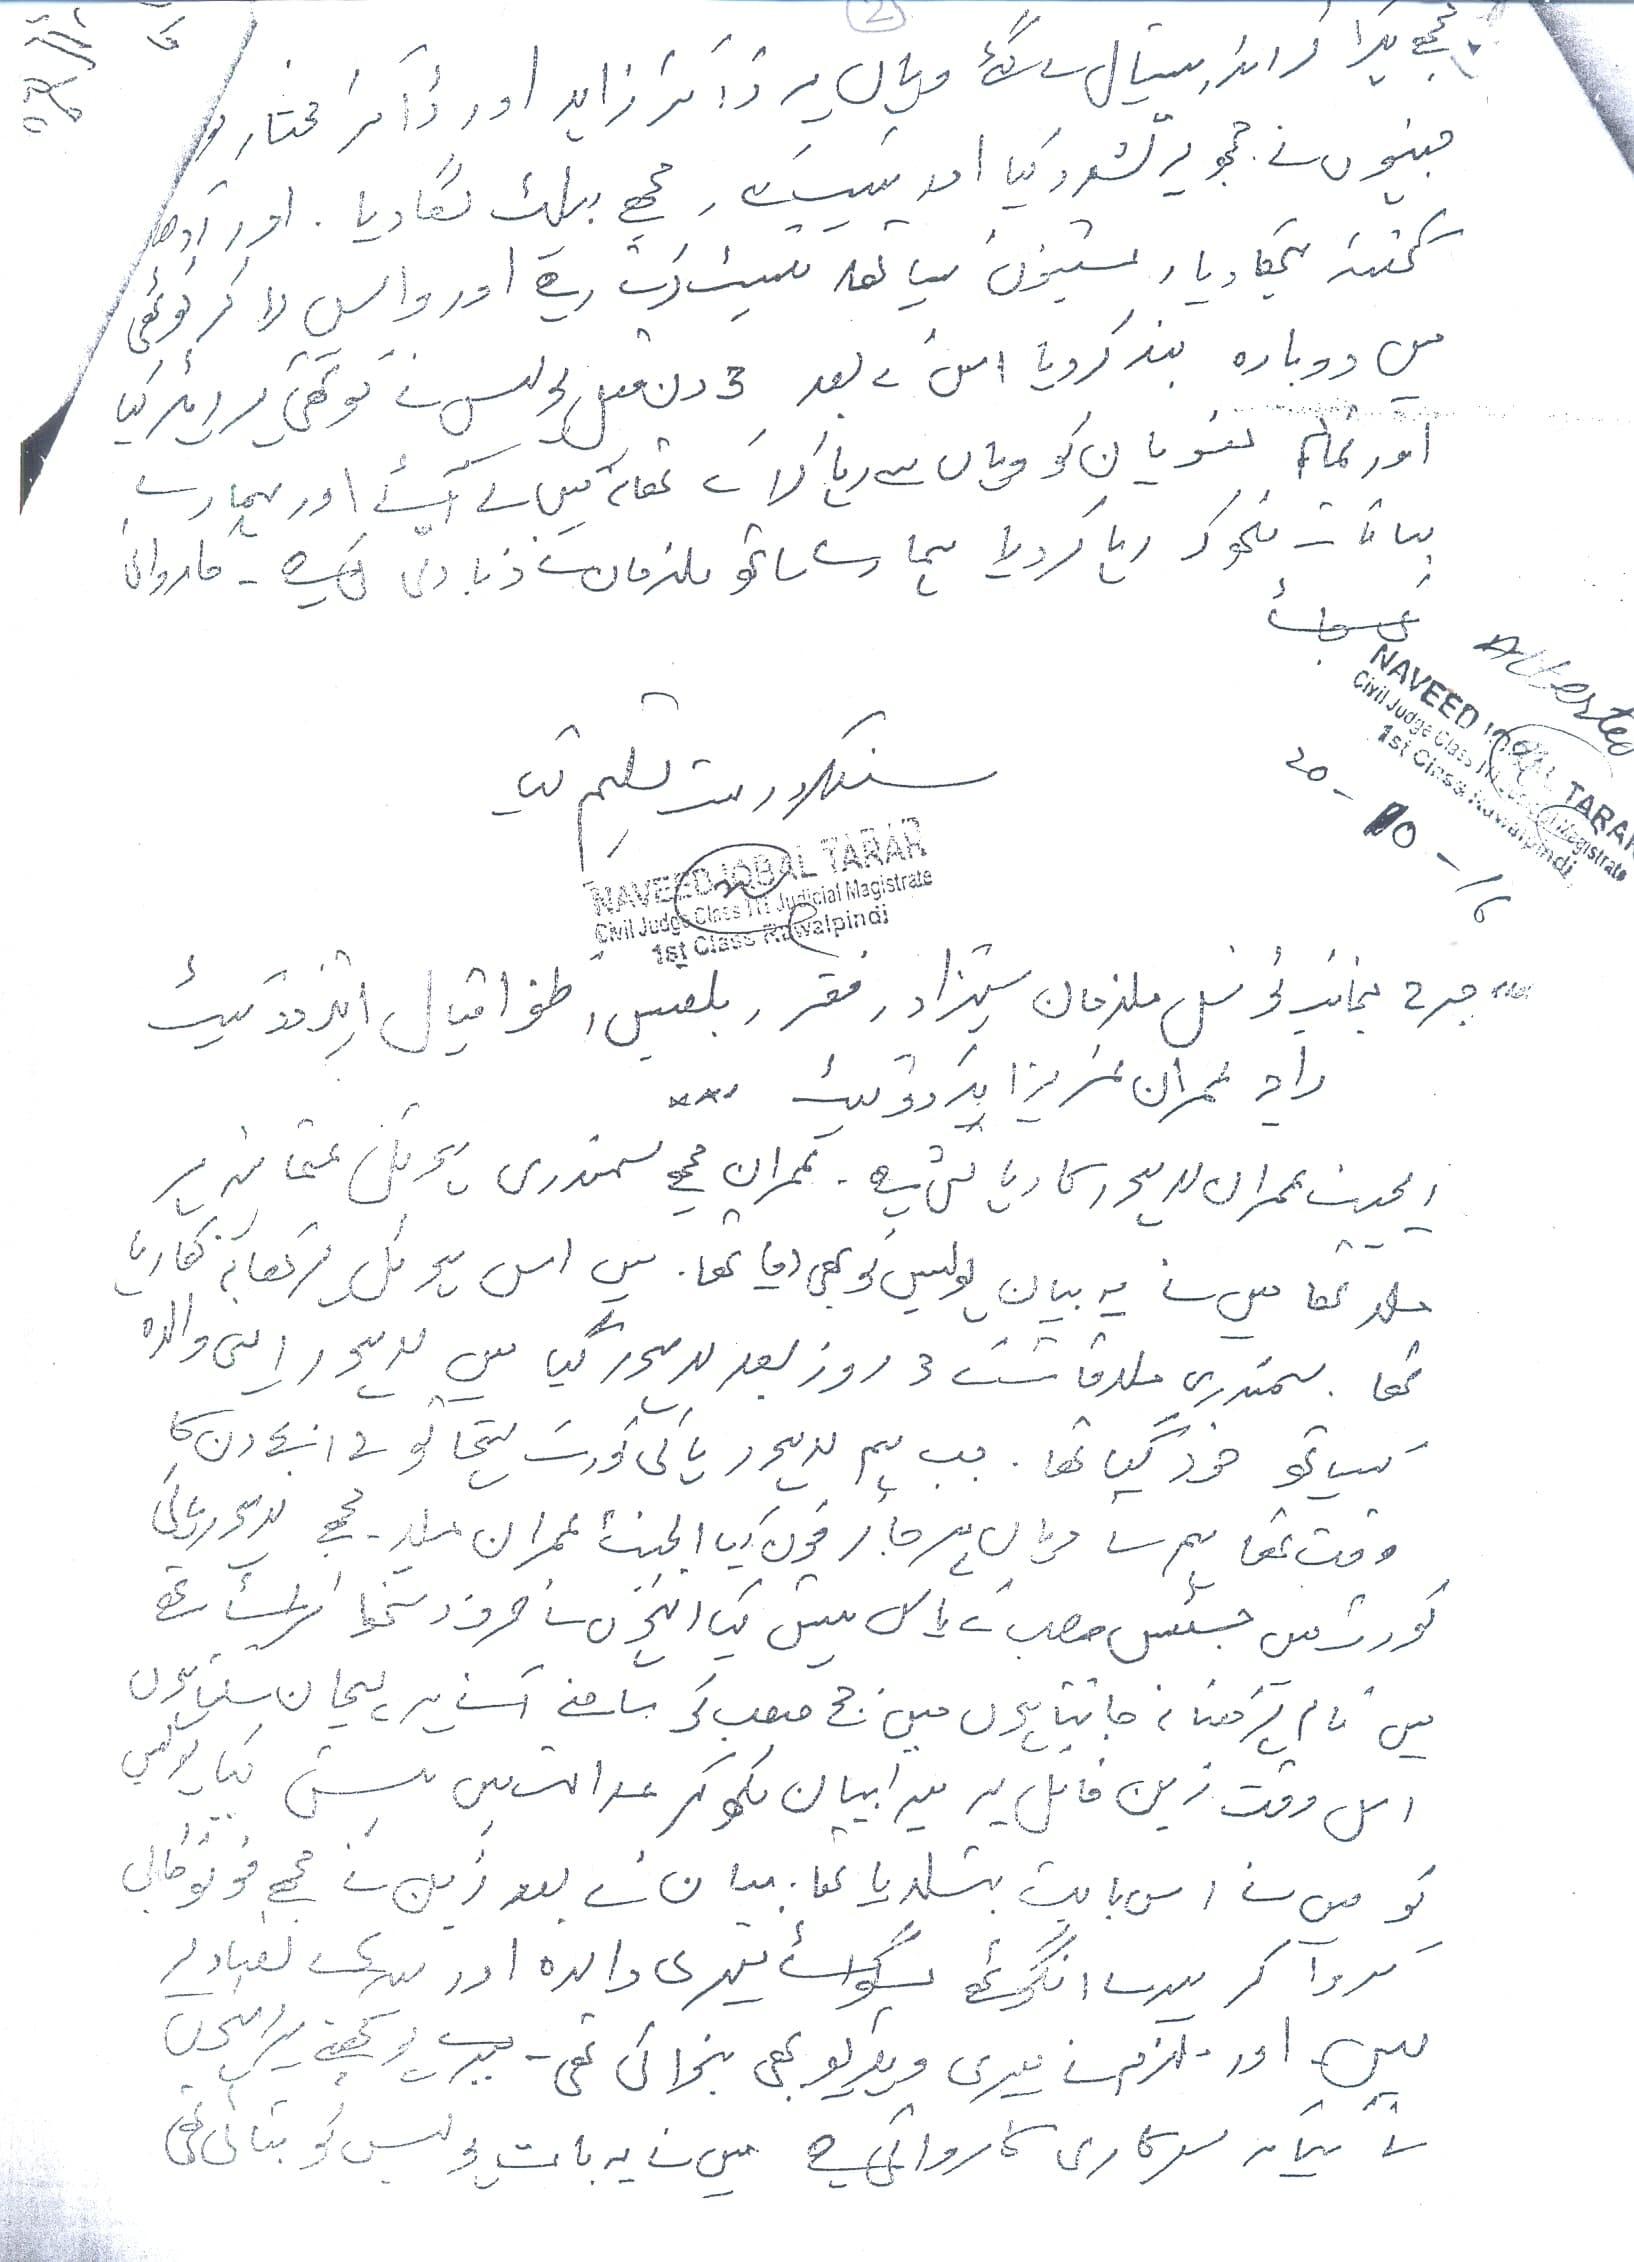 Organ trafficking: doctors, police and middlemen - Pakistan